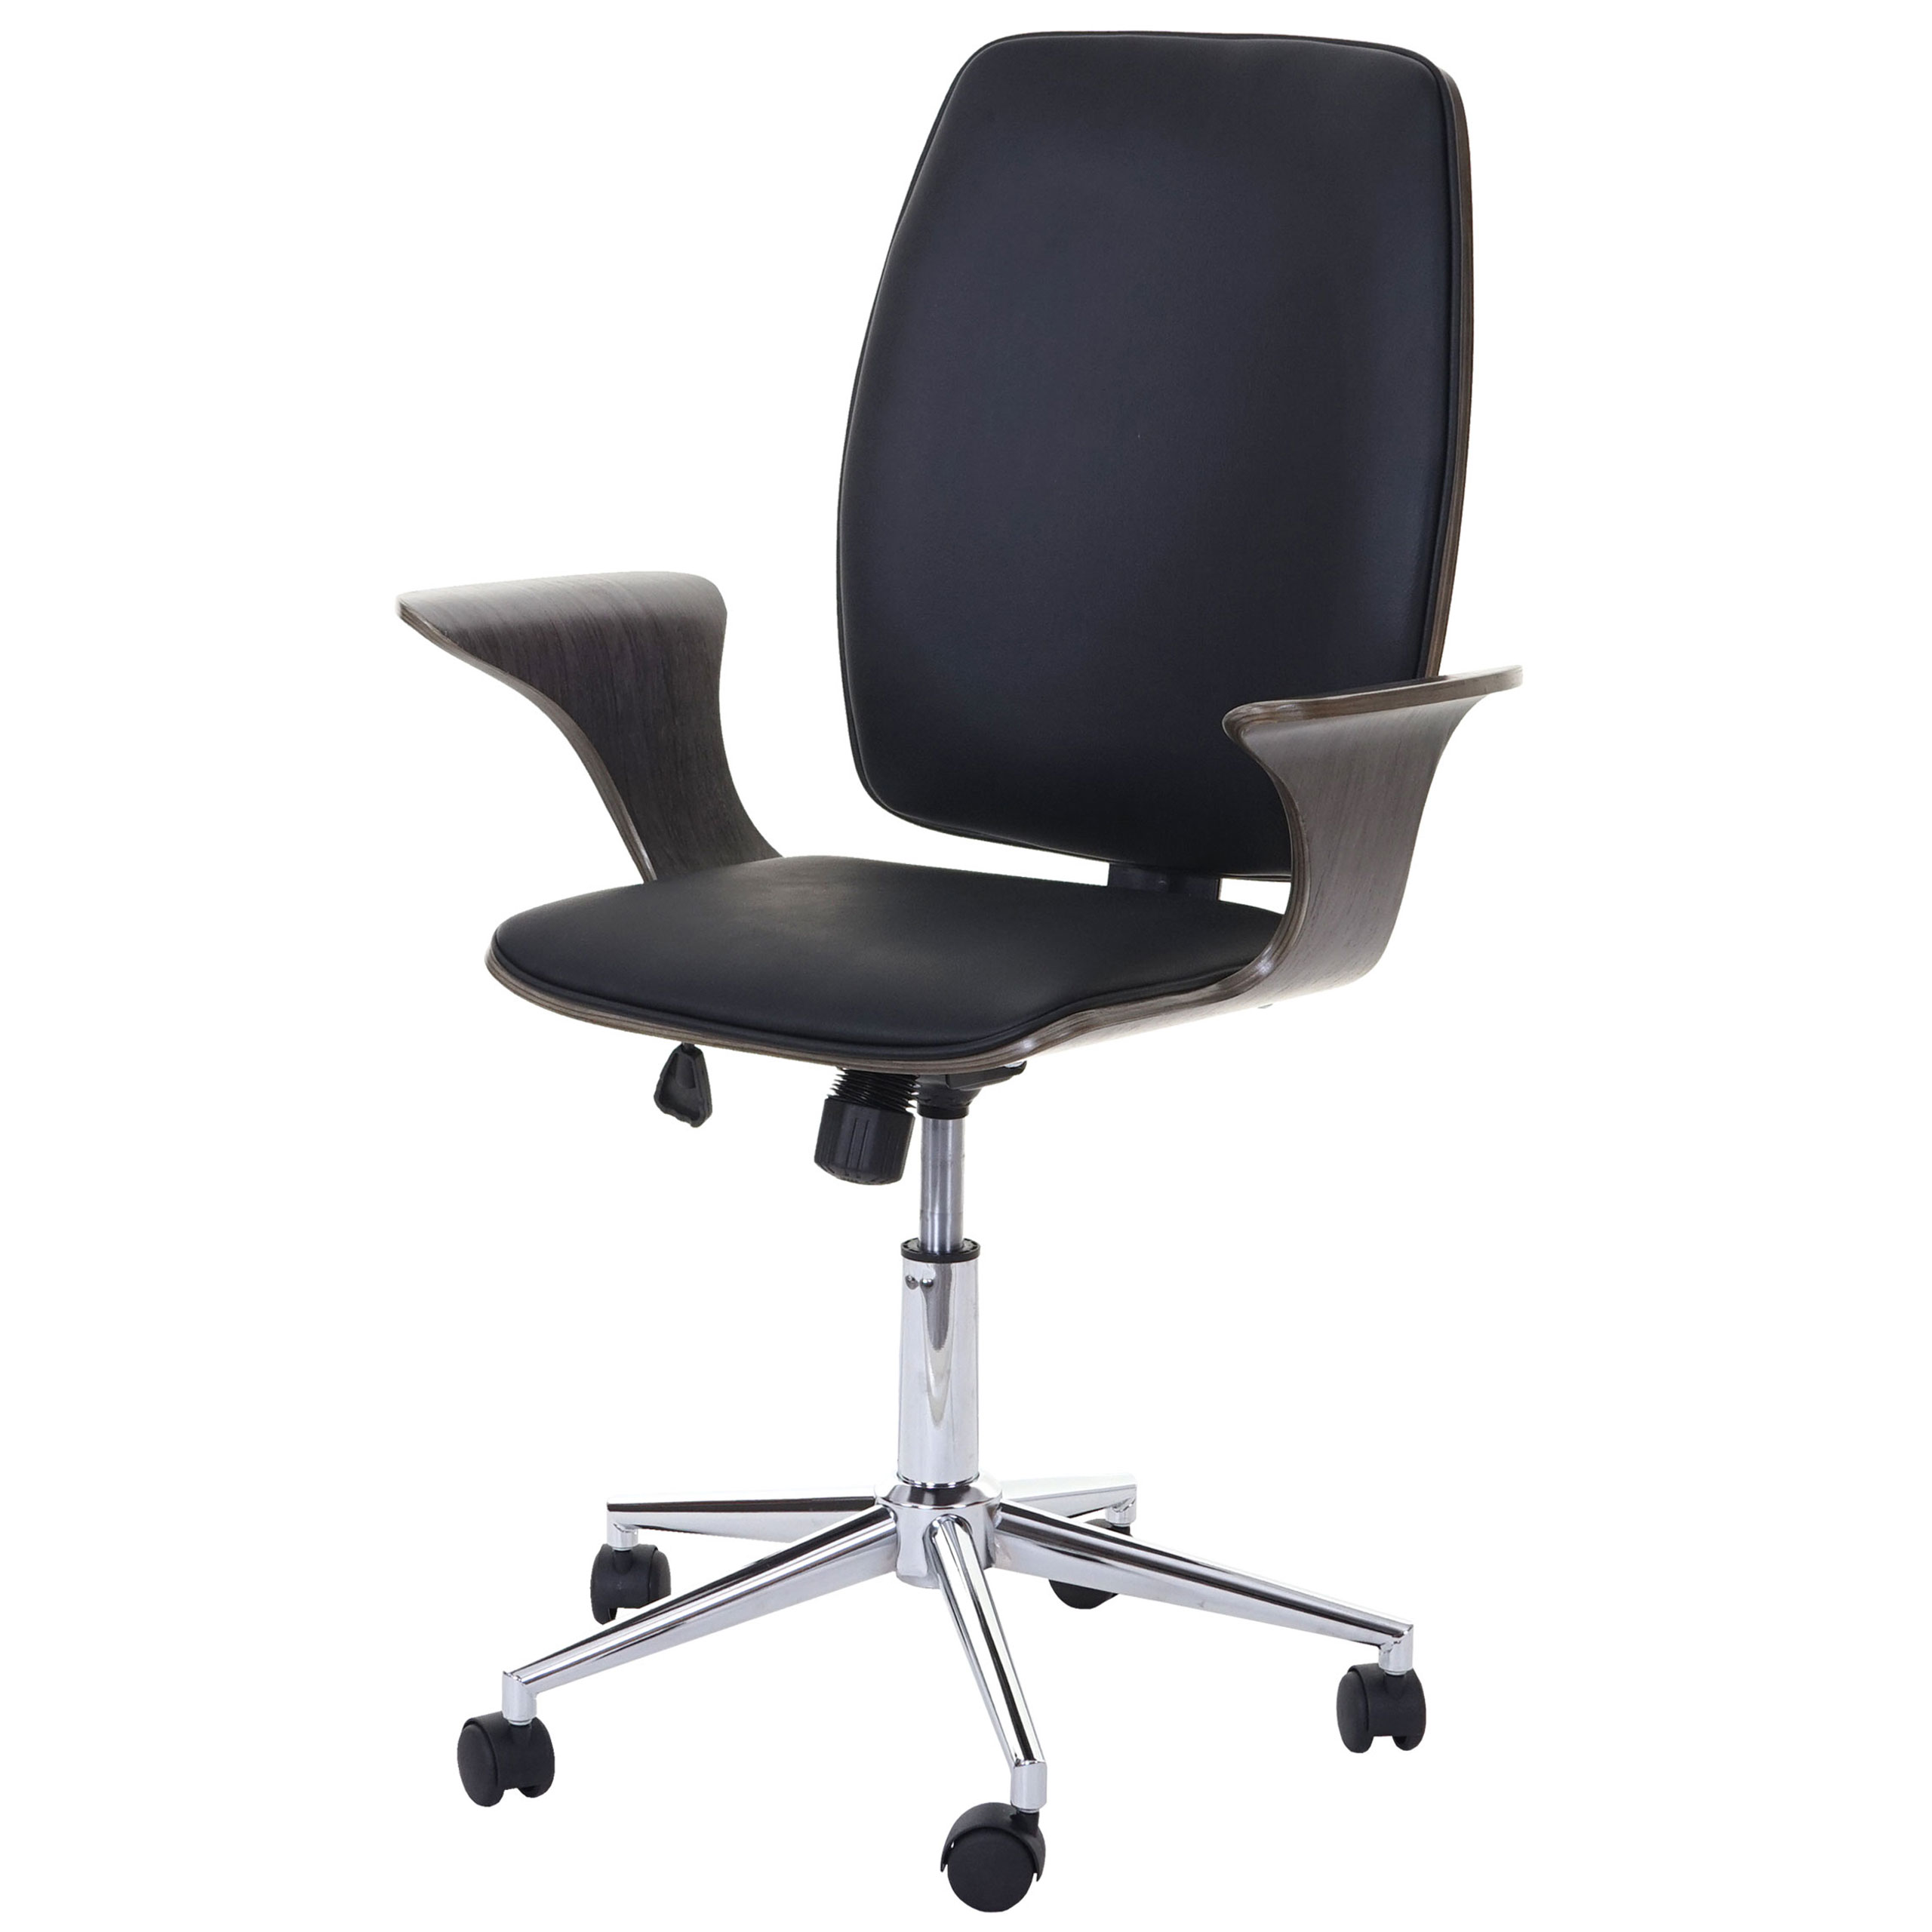 Bürostuhl HWC-C54, Grau Sitzfläche schwarz